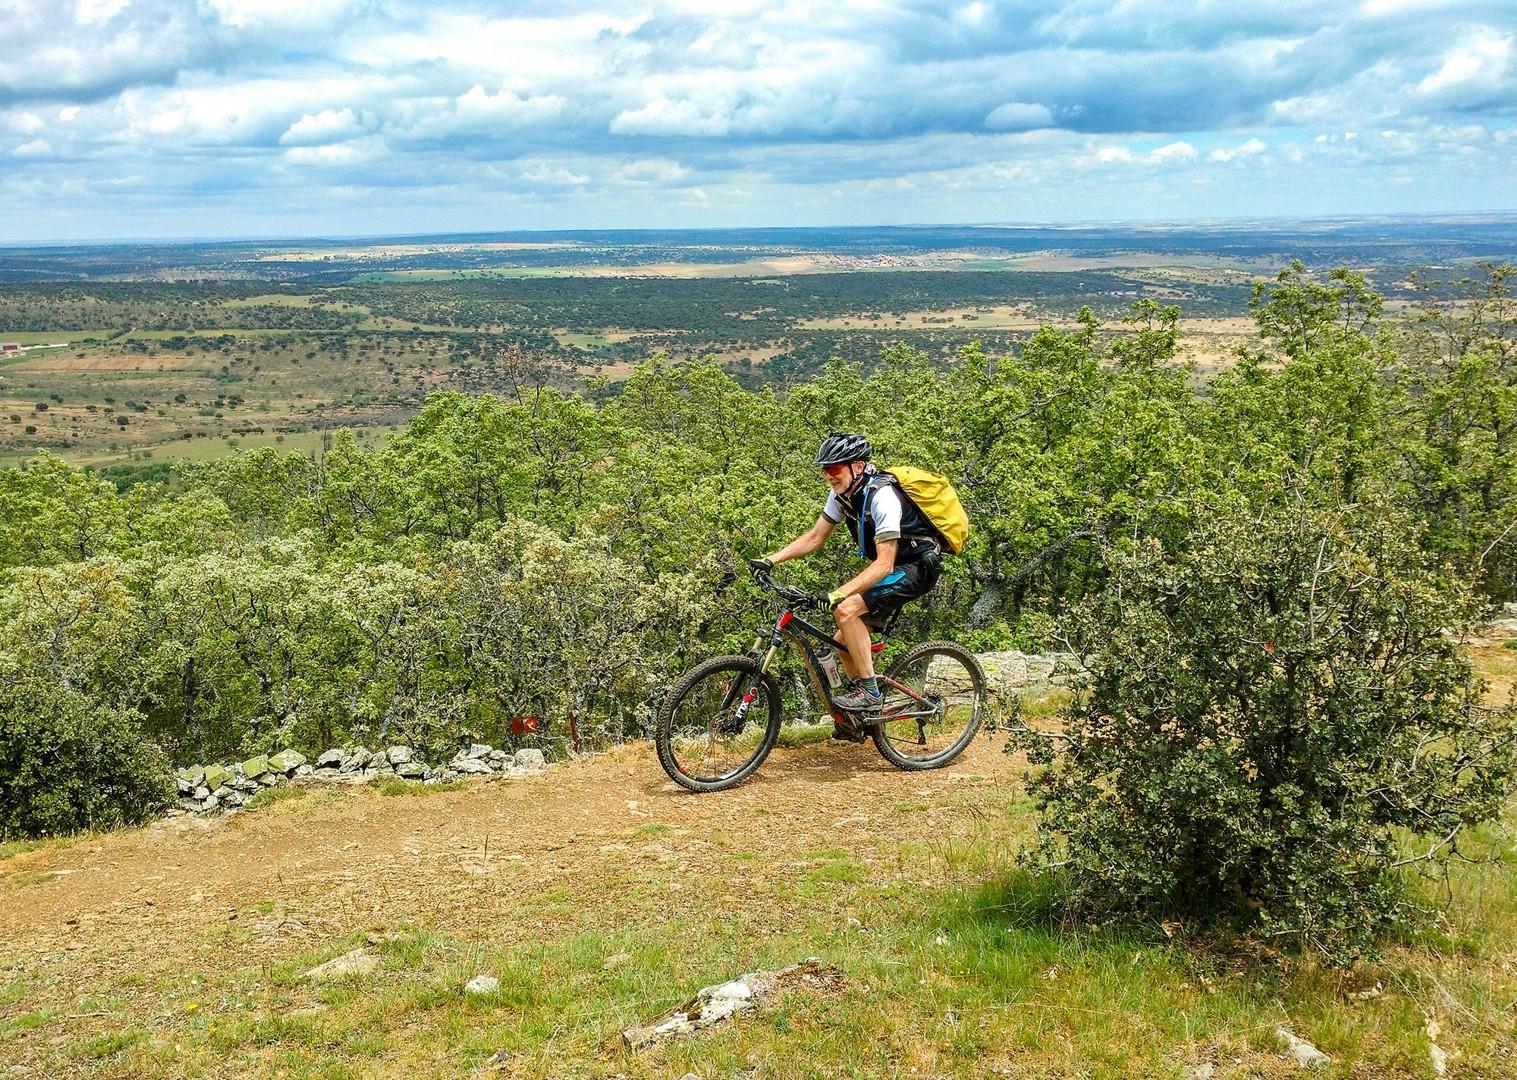 IMG_20170513_142426855.jpg - Spain - Ruta de la Plata - Guided Mountain Bike Holiday - Mountain Biking